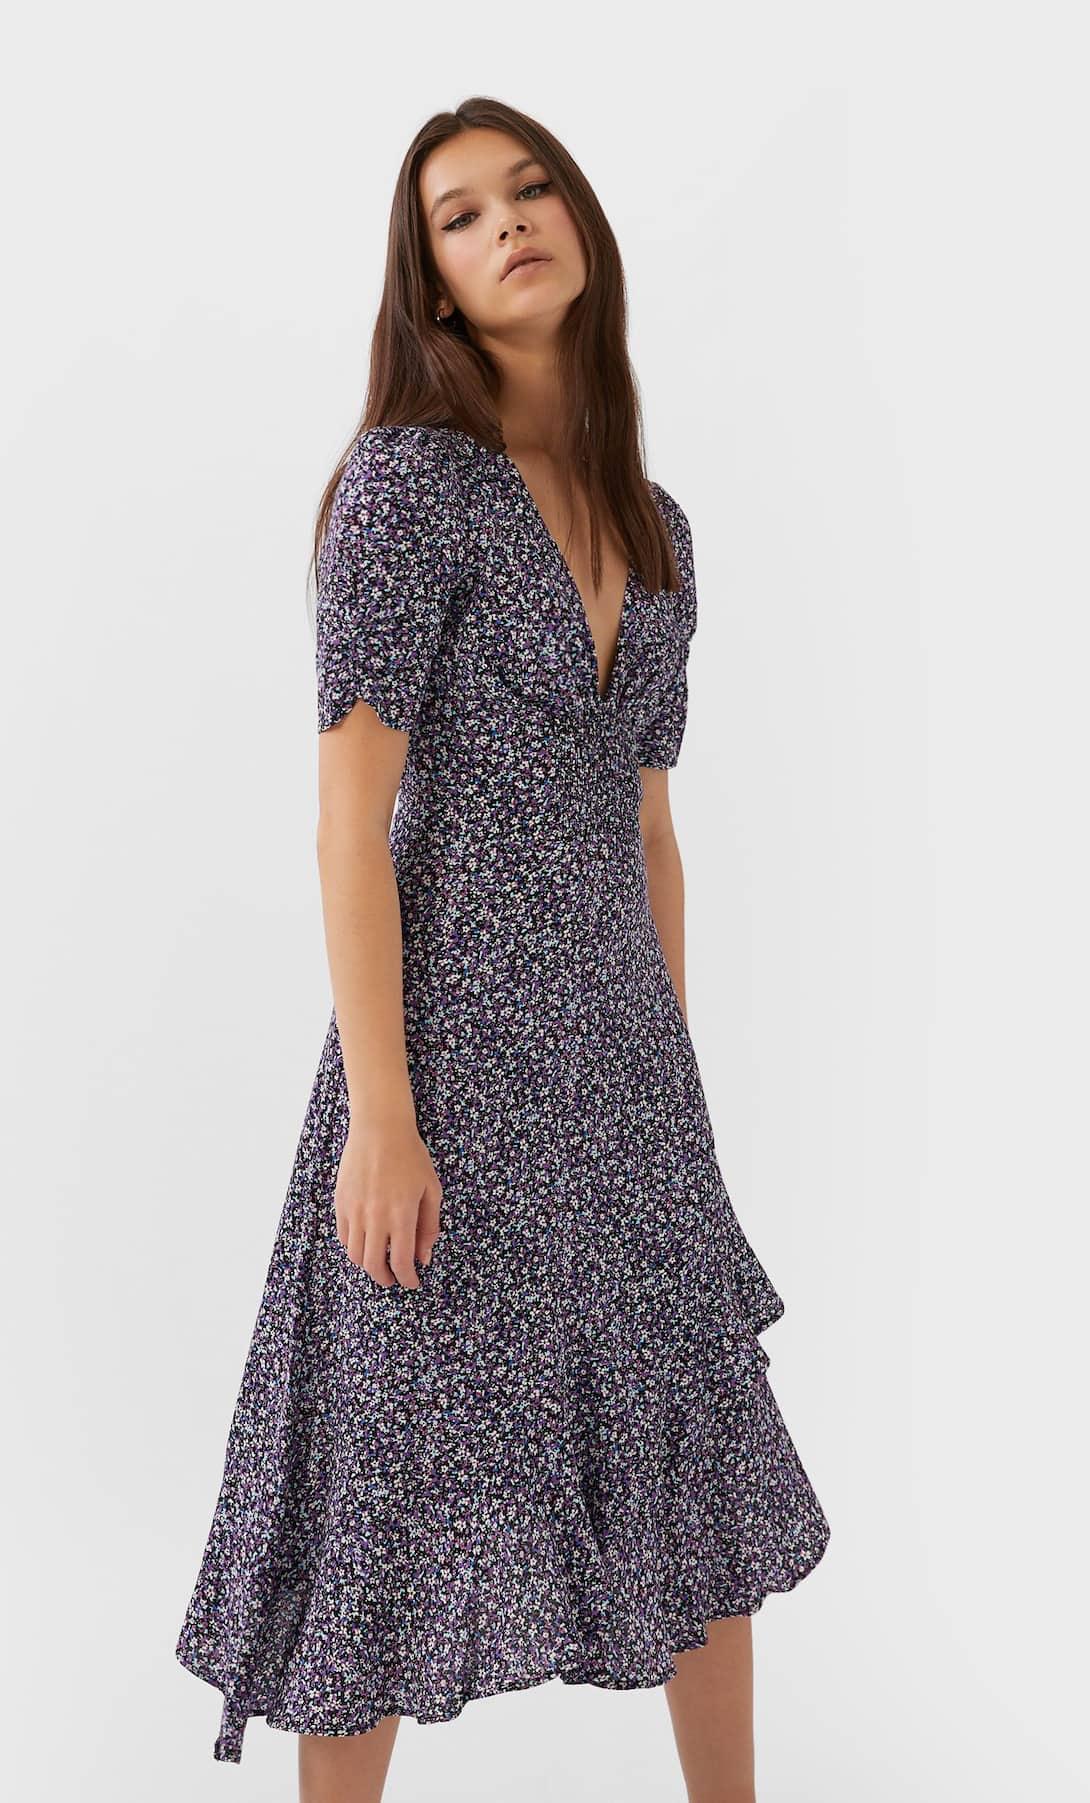 STR_Ruffled floral print midi dress_1 лучшие платья на лето